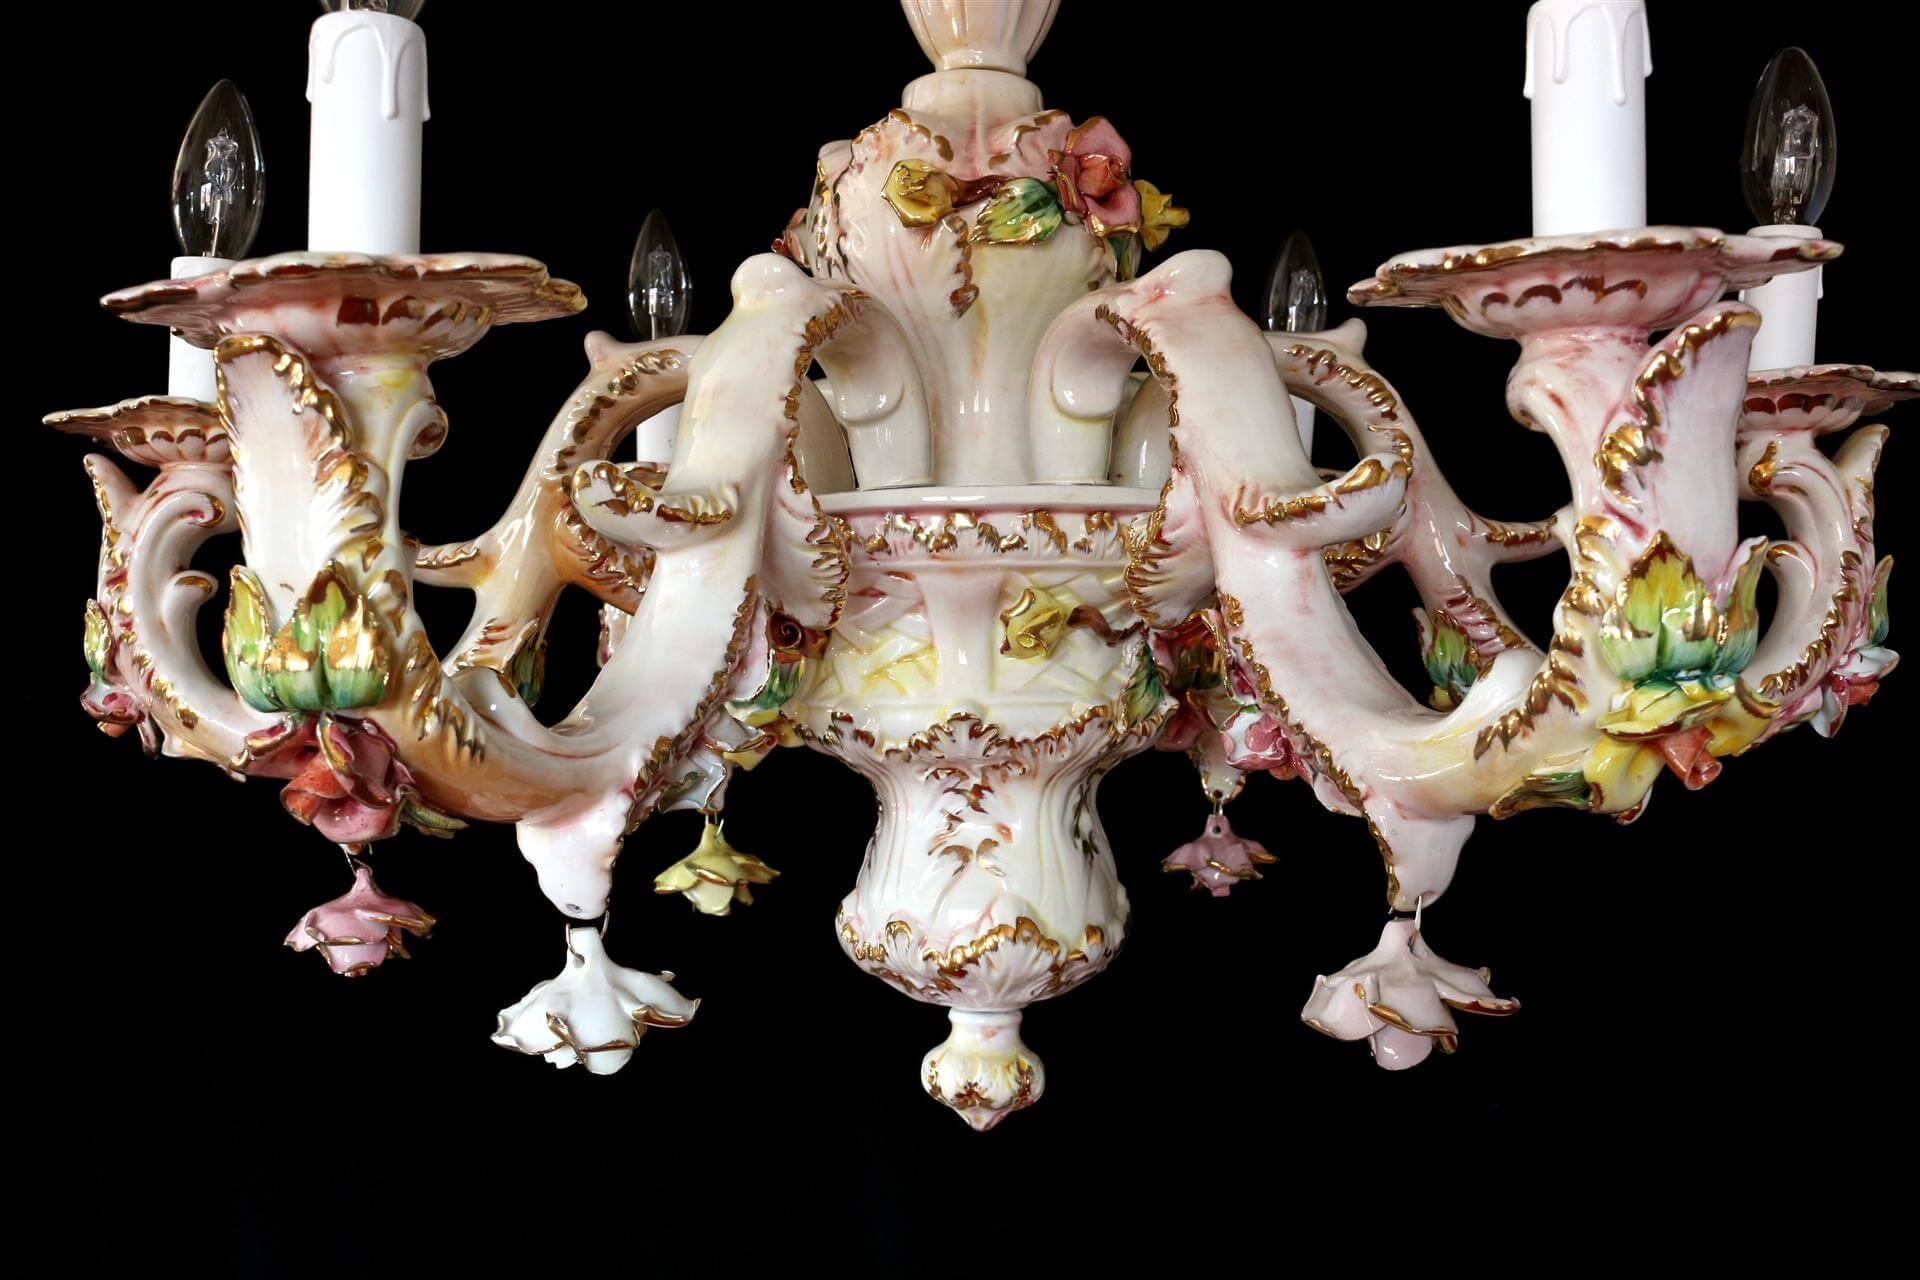 Lampadario Ceramica Di Bassano.Lampadario Ceramica Di Bassano Lando Lampadario In Biscotto Di